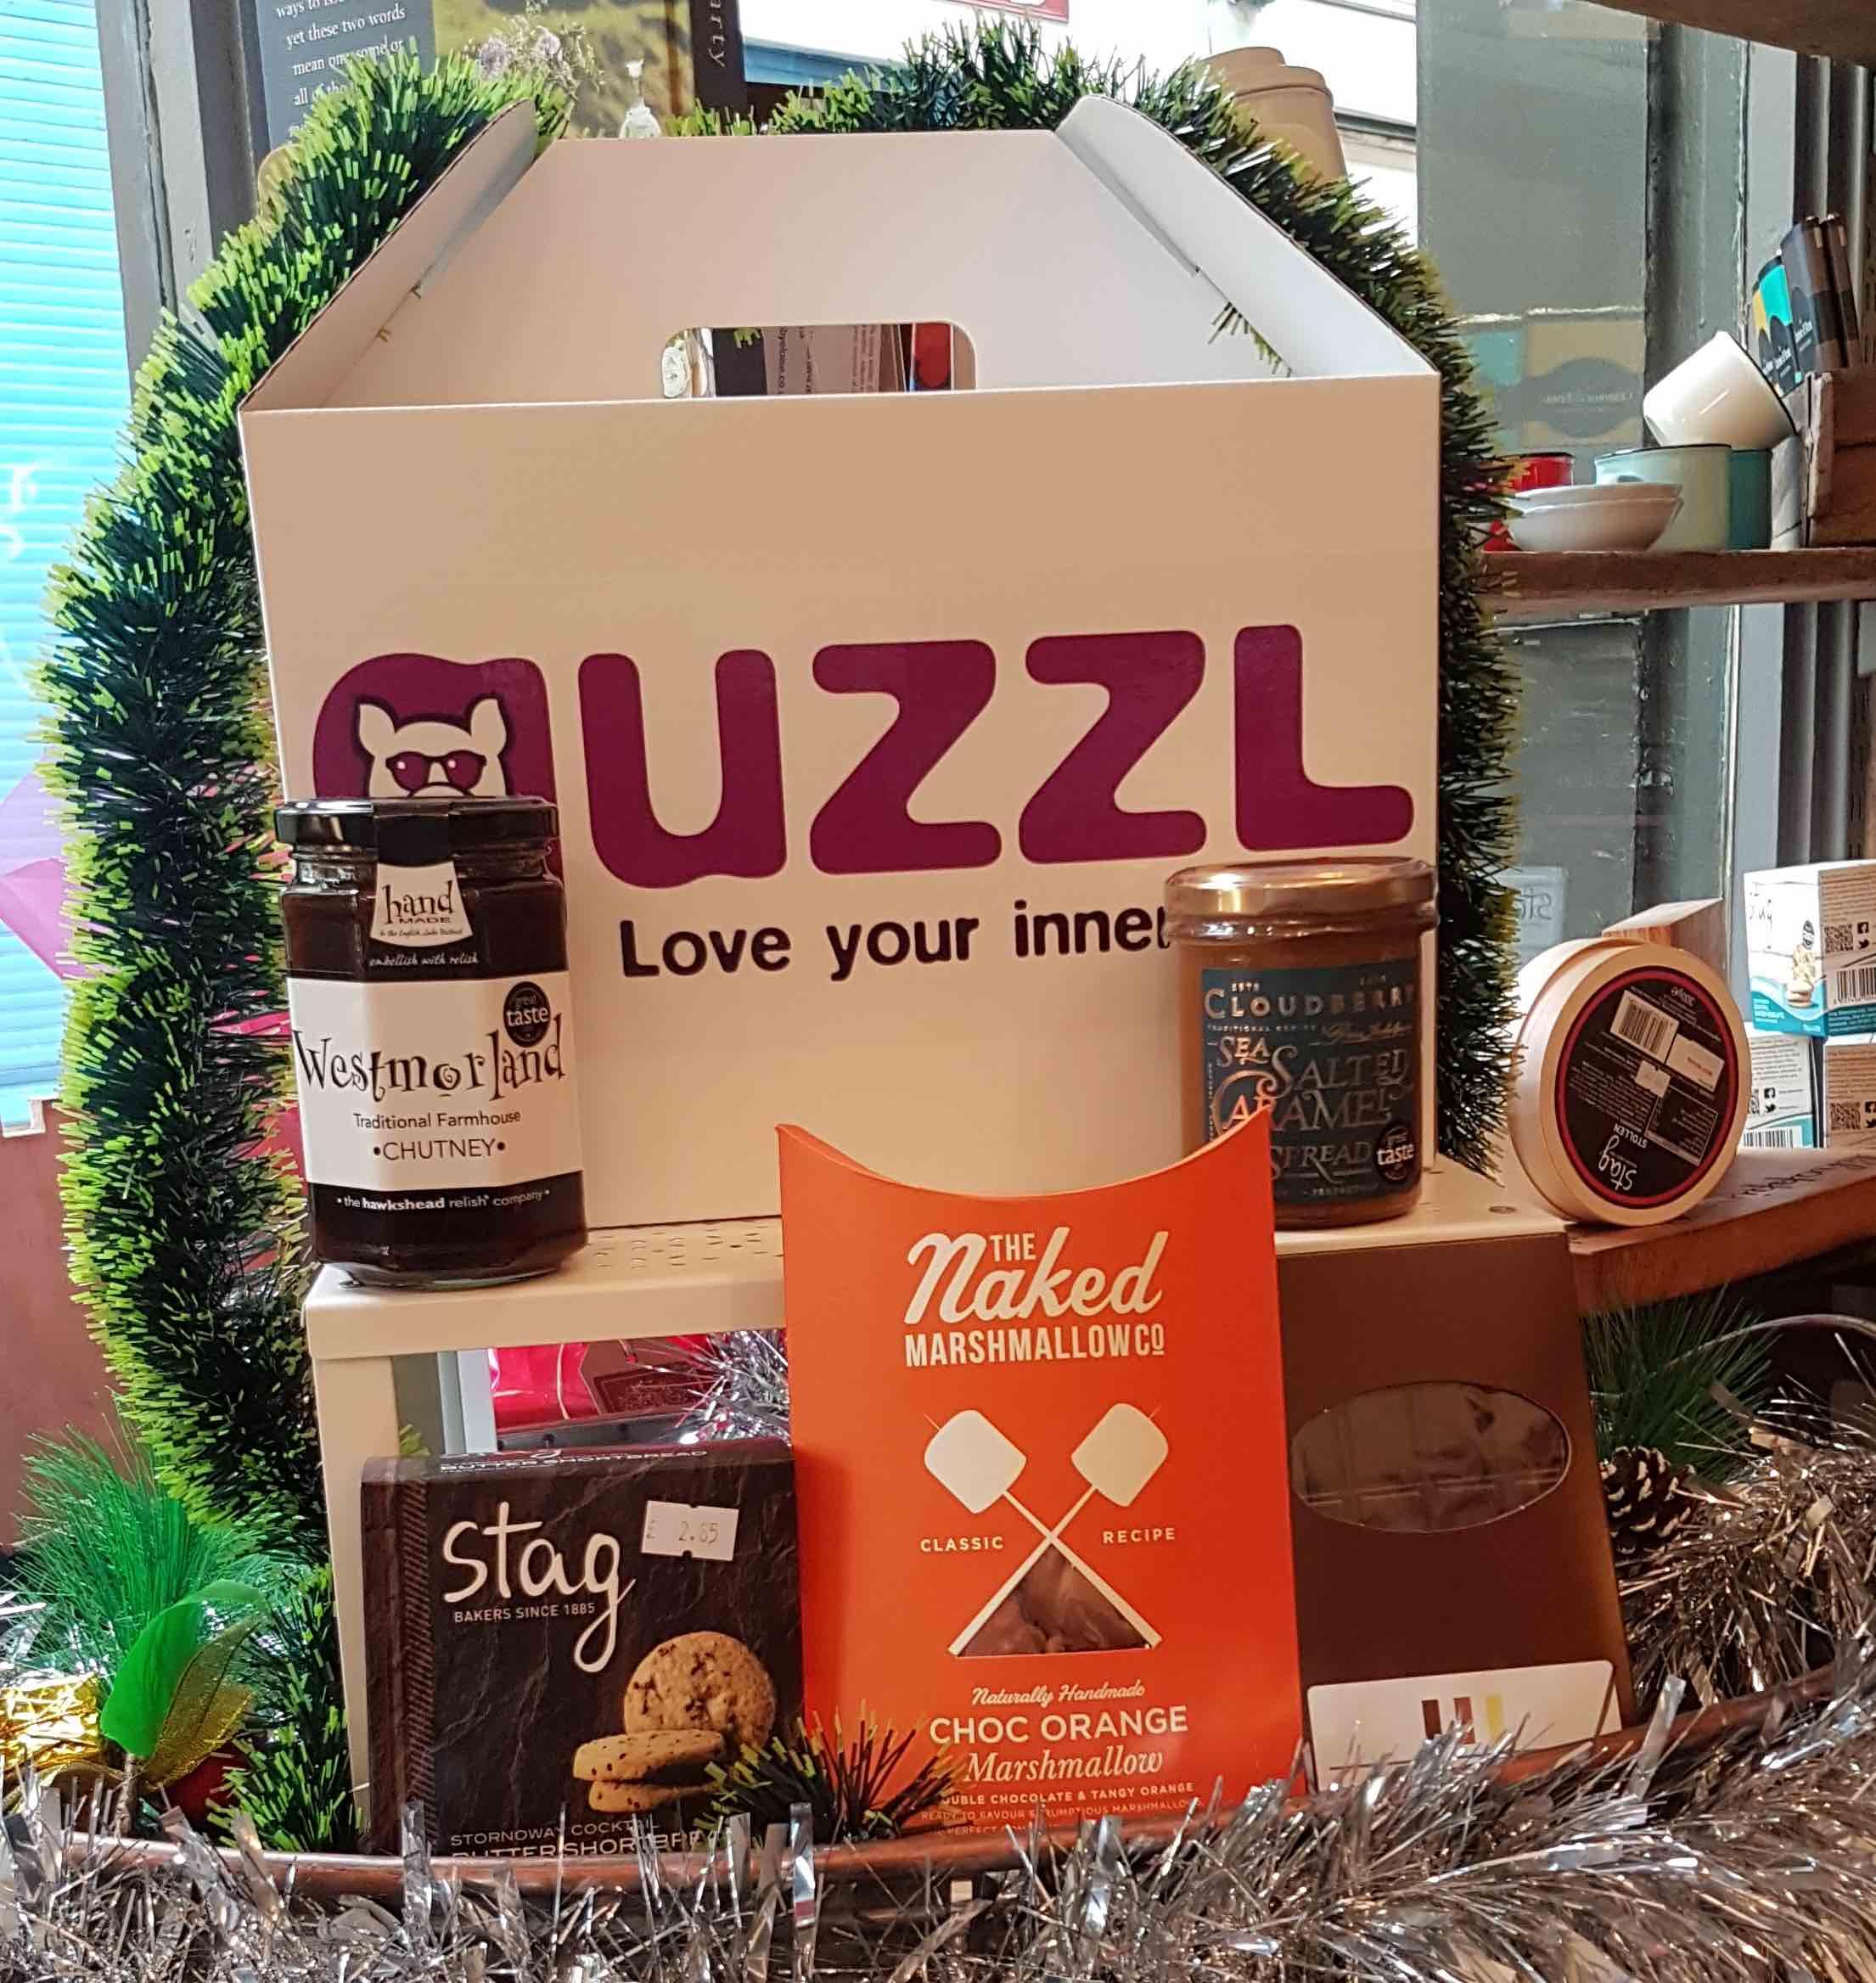 The £25 Guzzl Selection Box